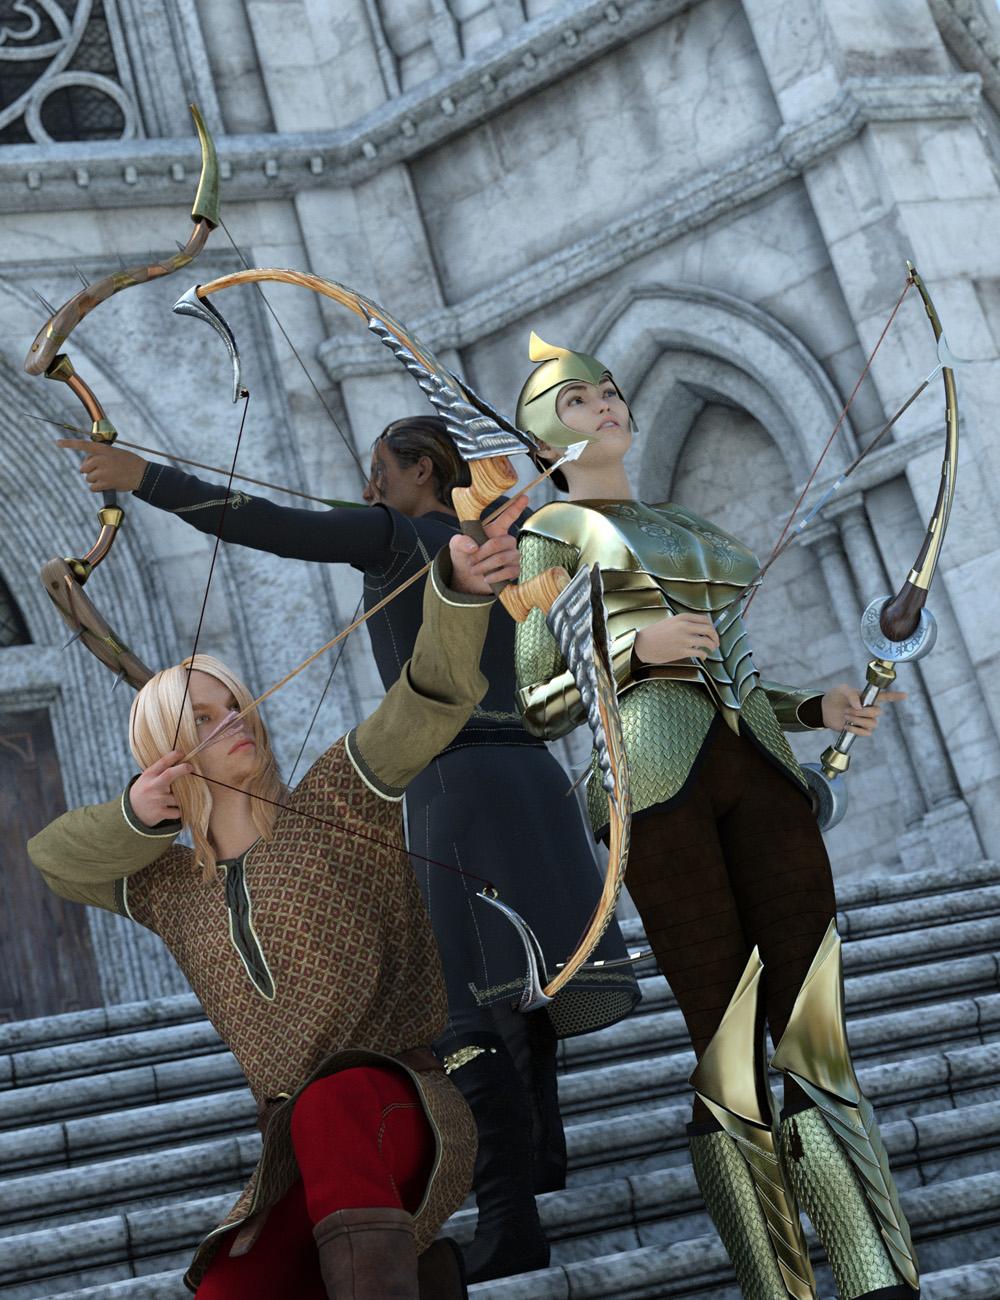 Fantasy Bows and Arrows by: Valandar, 3D Models by Daz 3D